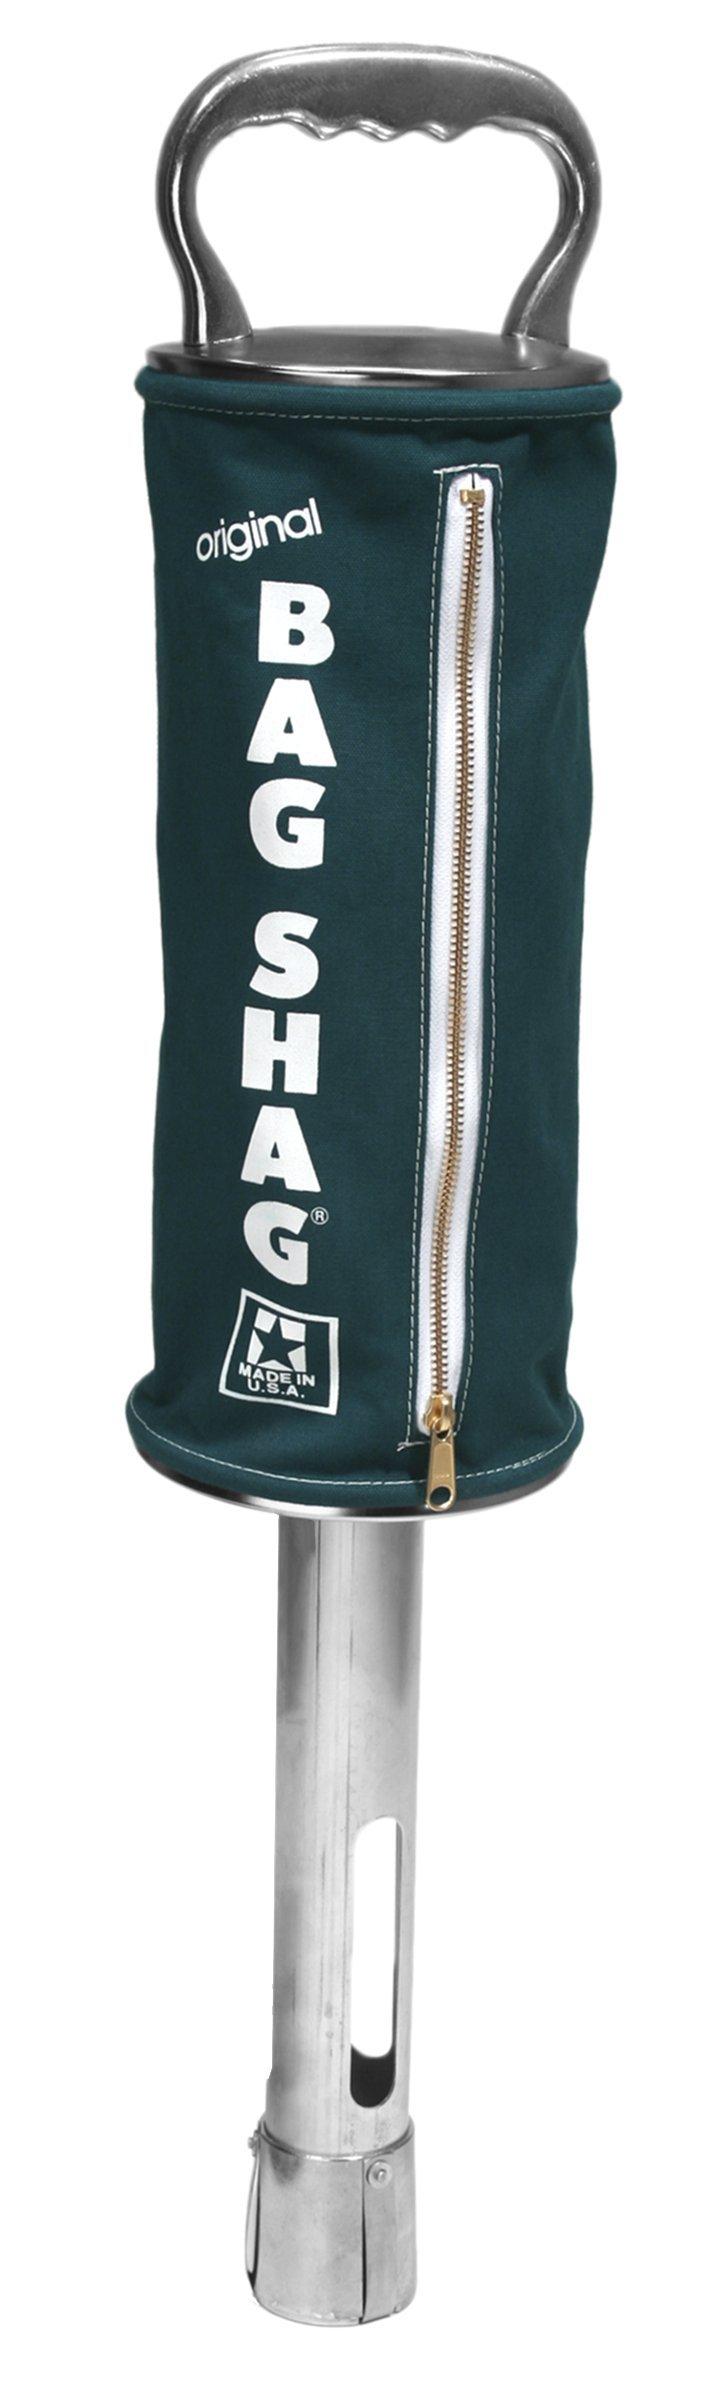 Original Bag Shag Practice and Range Golf Ball Shagger Made in the USA by Original Bag Shag Practice and Range Golf Ball Shagger Made in the USA